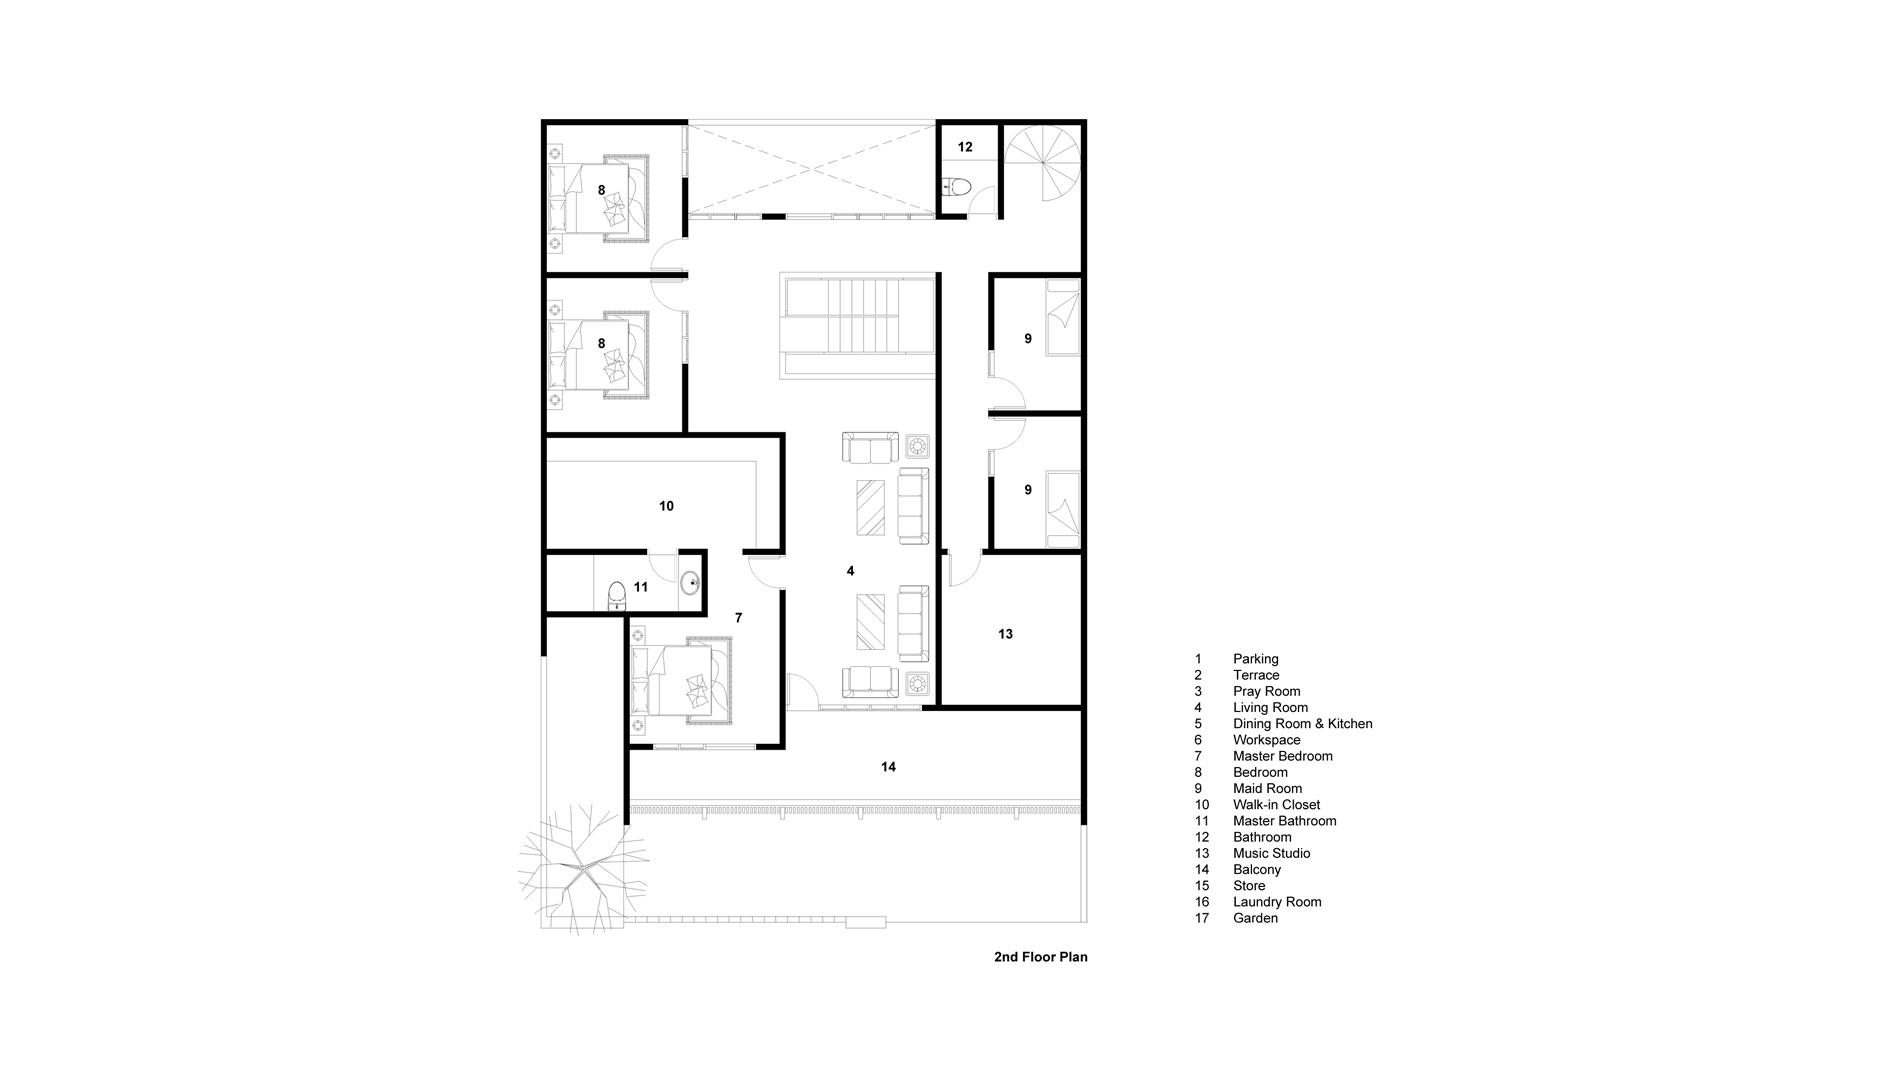 2015-BATUNUNGGAL-HOUSE-04